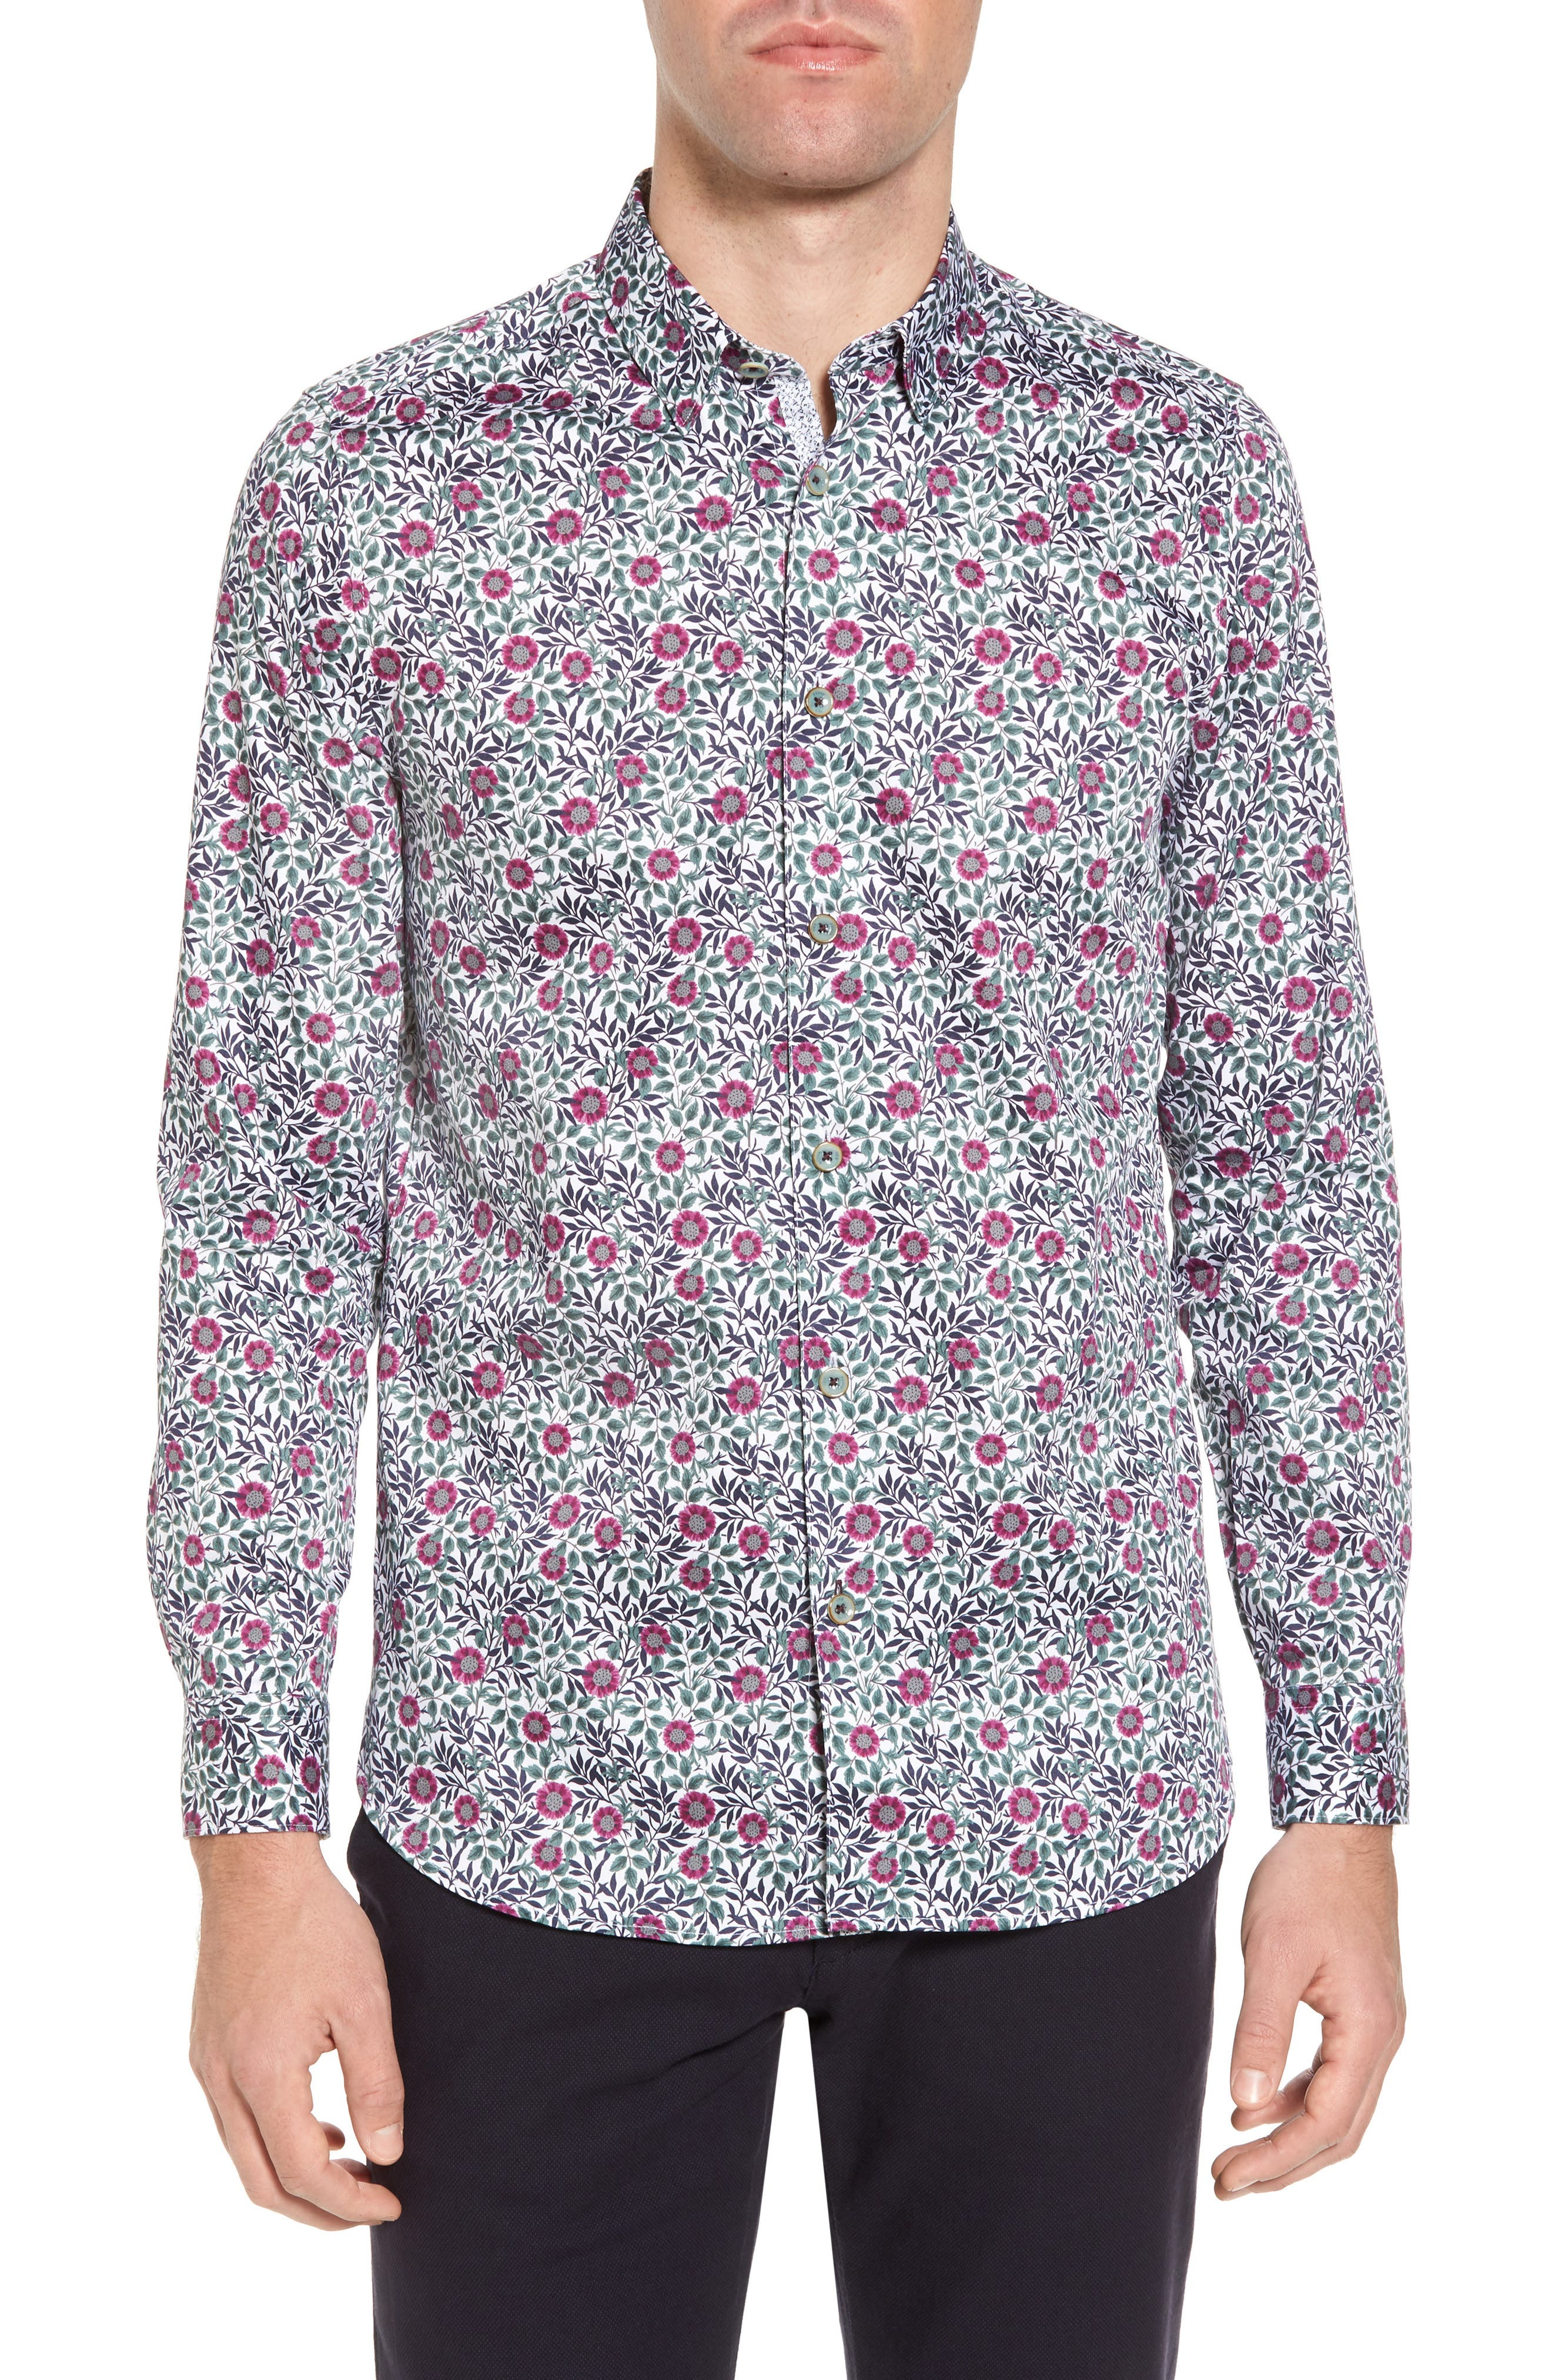 Orense Floral Print Slim Fit Shirt,                         Main,                         color, Green